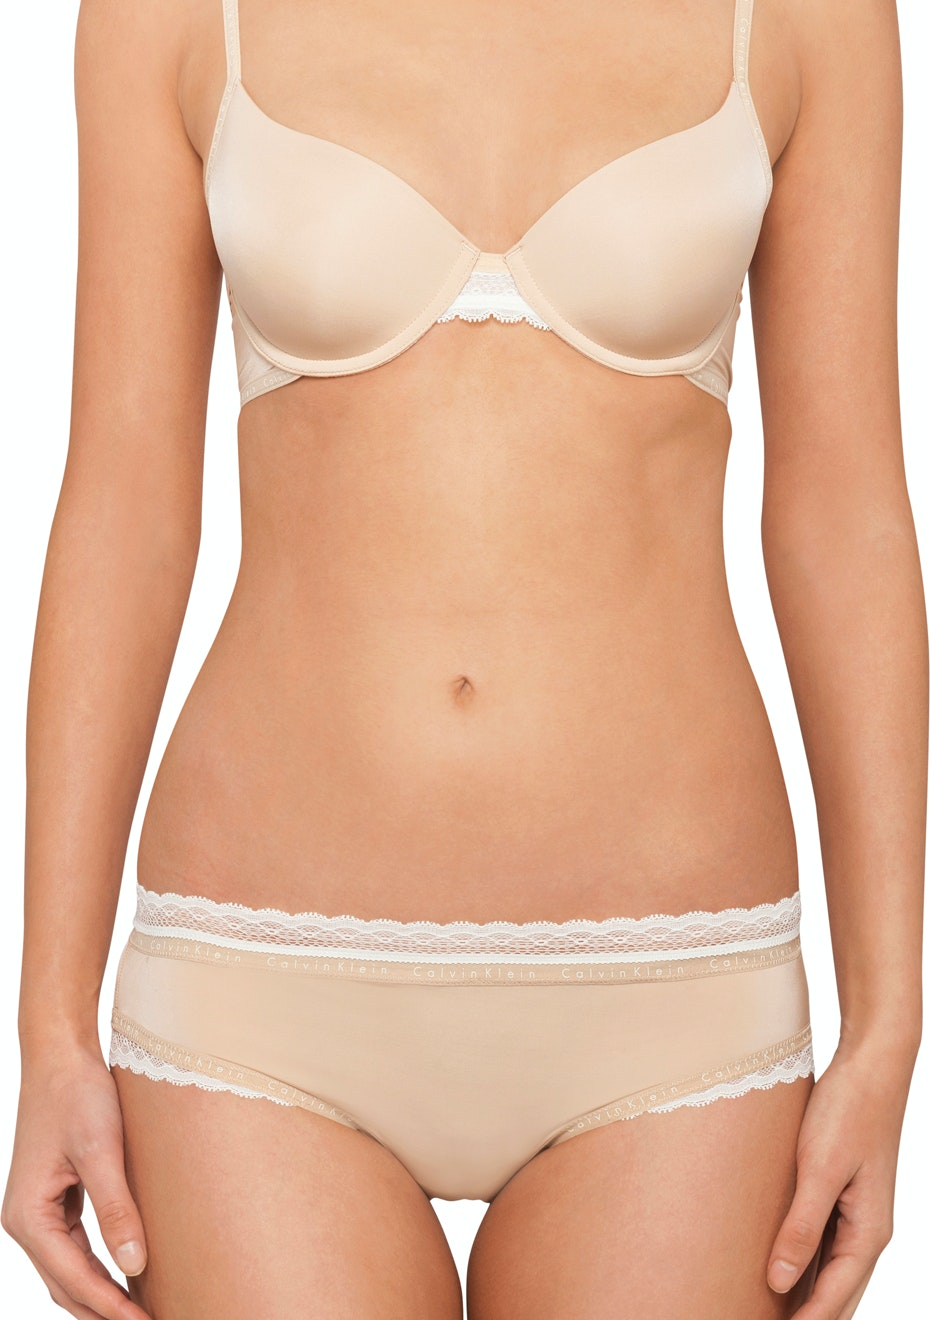 Calvin Klein - Signature, Demi Lightly Lined Tshirt Bra - Bare